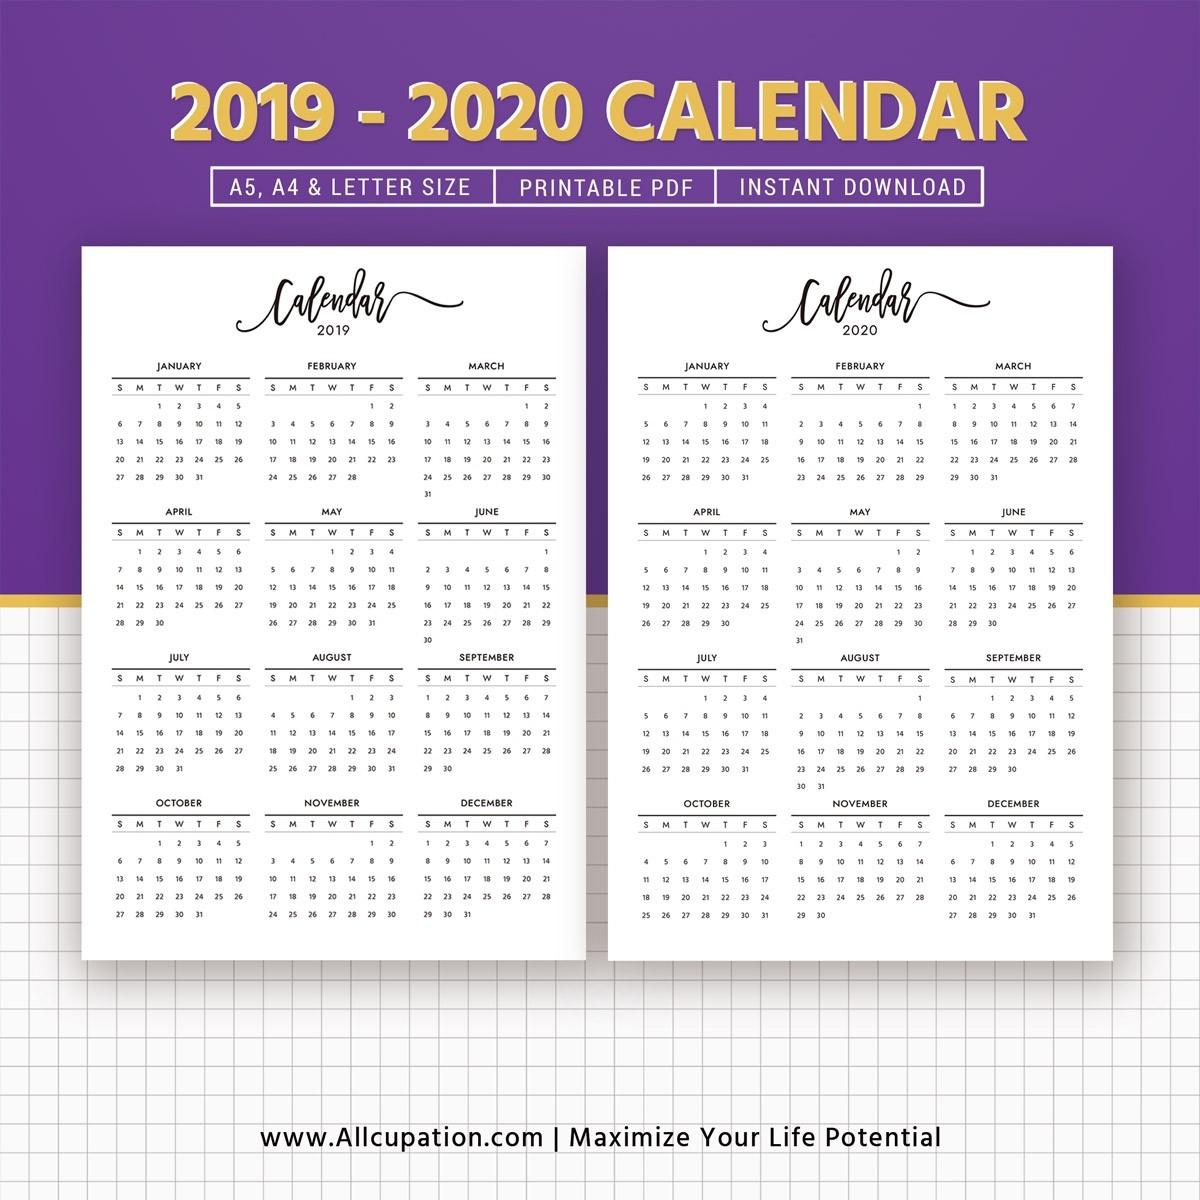 2019-2020 Calendar, Printable Calendar, Planner Design, Best Planner,  Planner Printable, Planner Inserts, Filofax A5, A4, Letter, Instant Download-Printable 2020 Blank Calendar On 8 X 11 Size